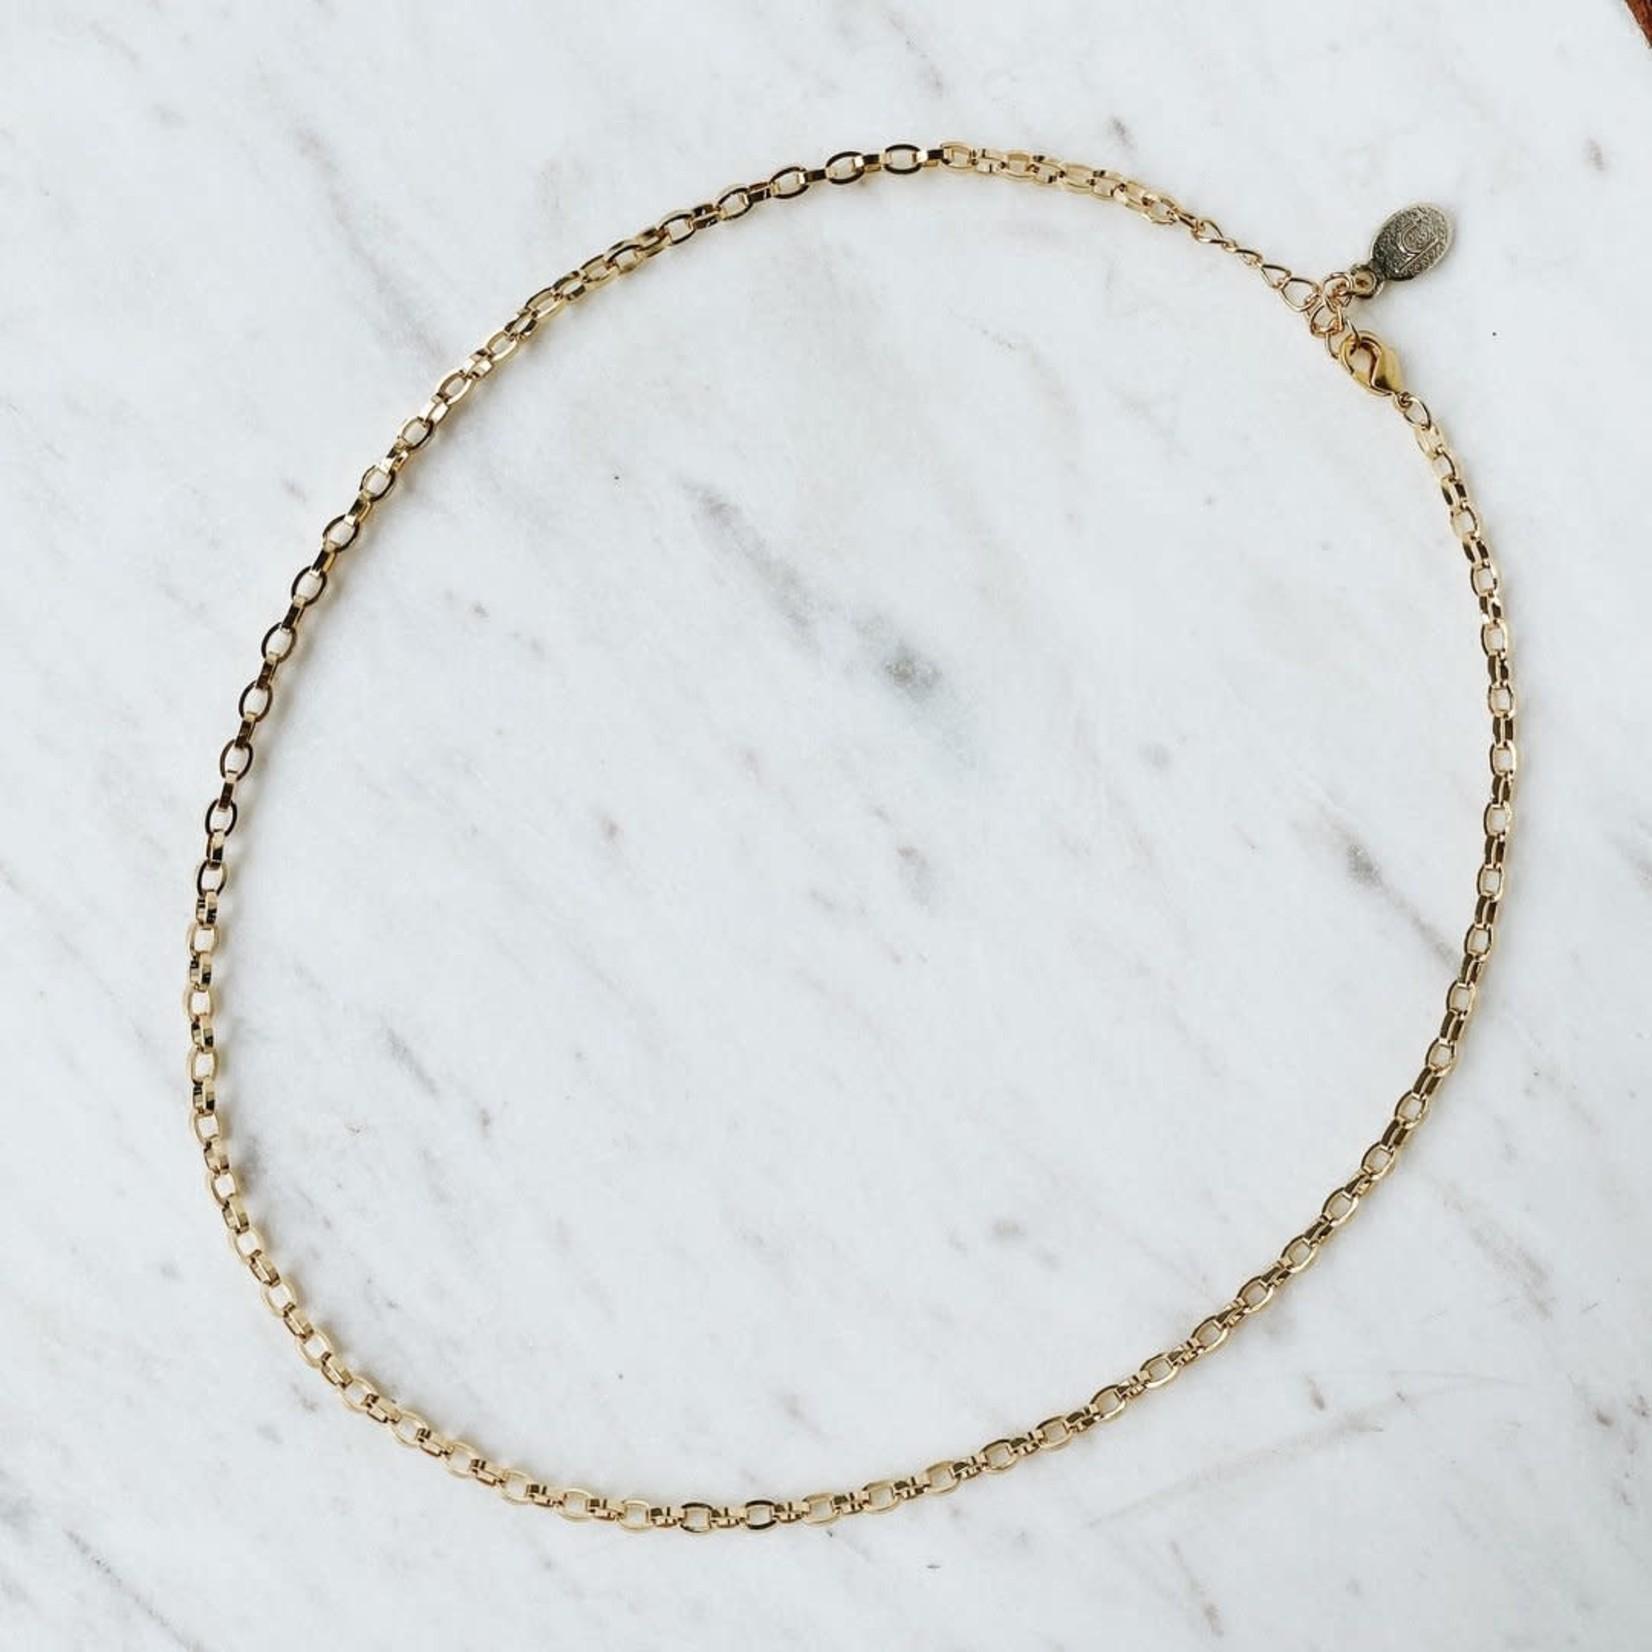 Horace Jewelry Horace collier DIPOKO